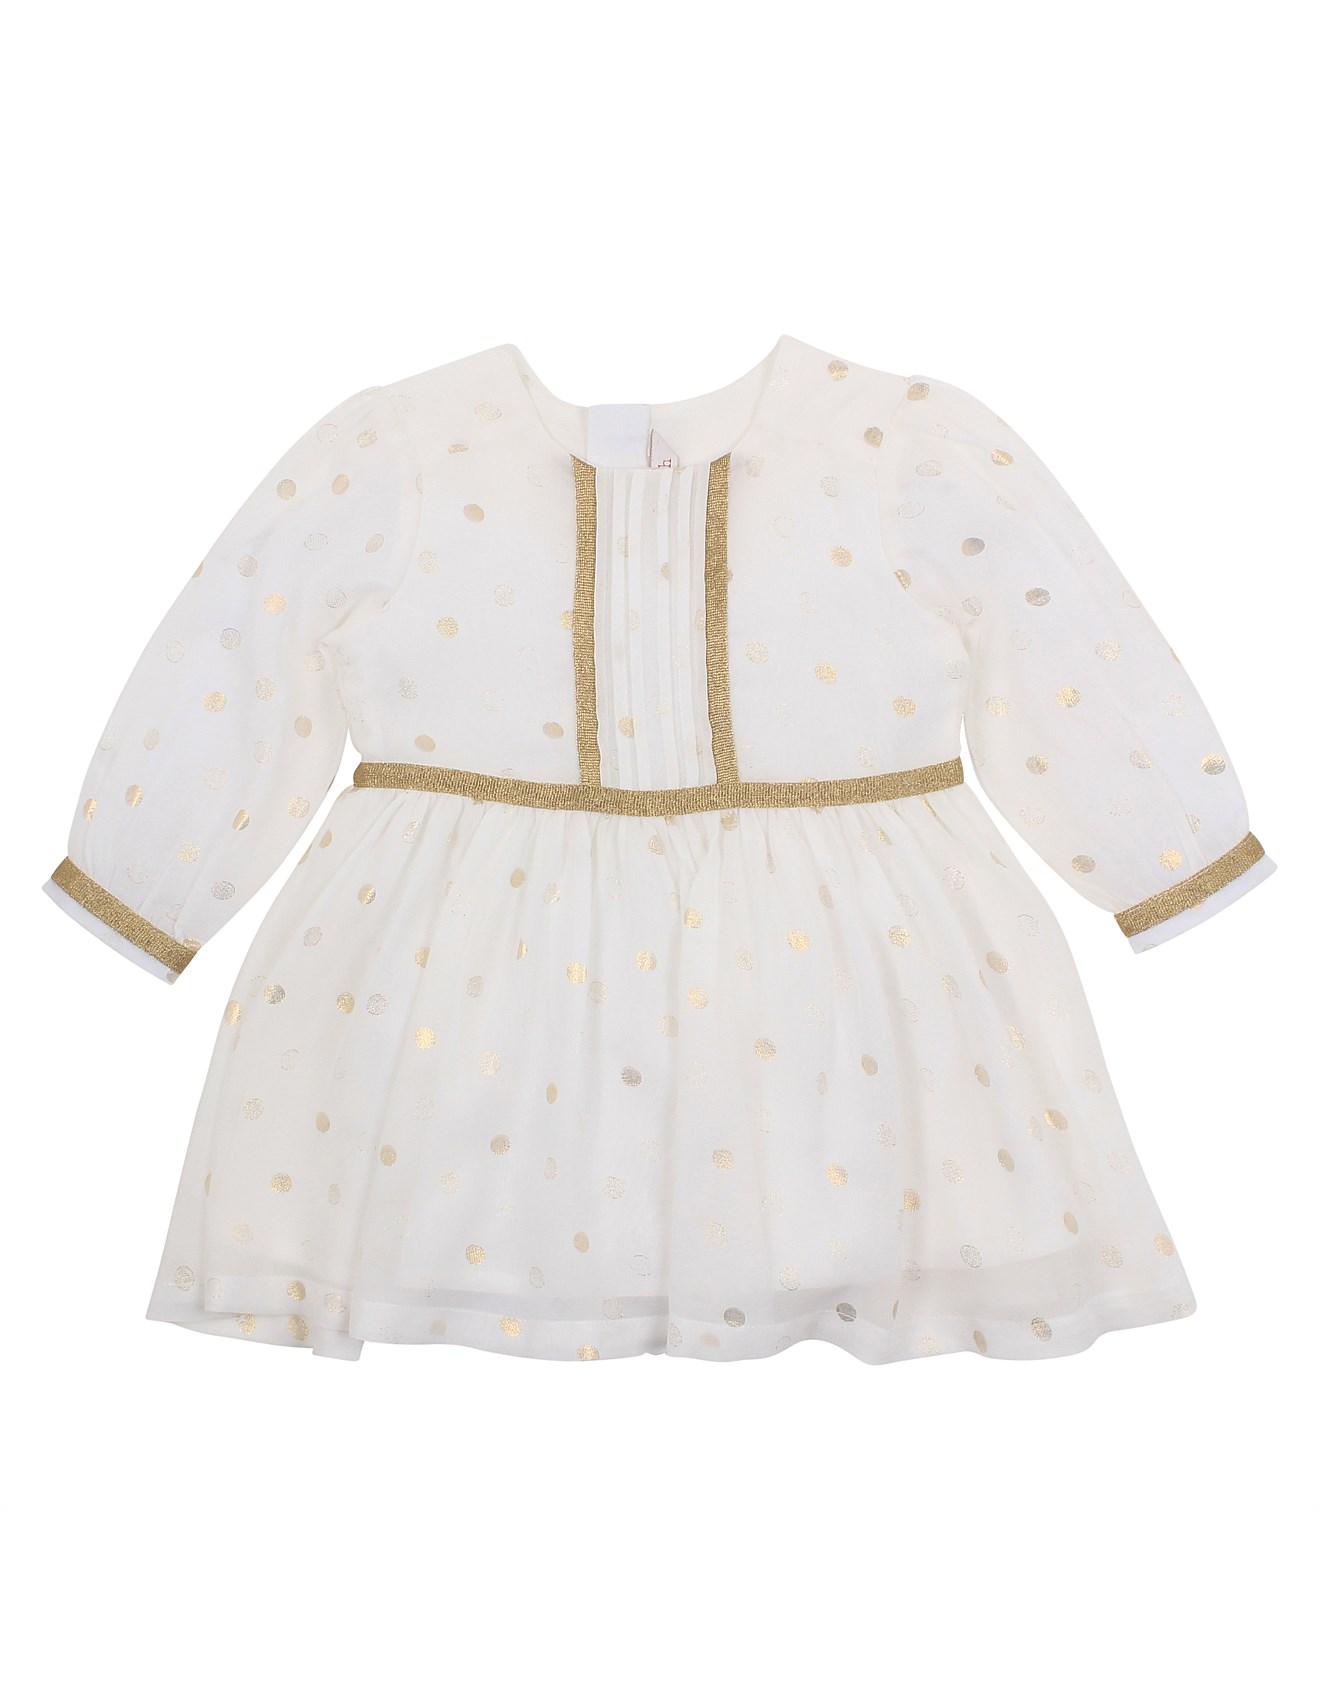 e4426fc9 Girl's Clothing   Girl's Dresses & More Online   David Jones - SPARKLE SPOT  PARTY DRESS